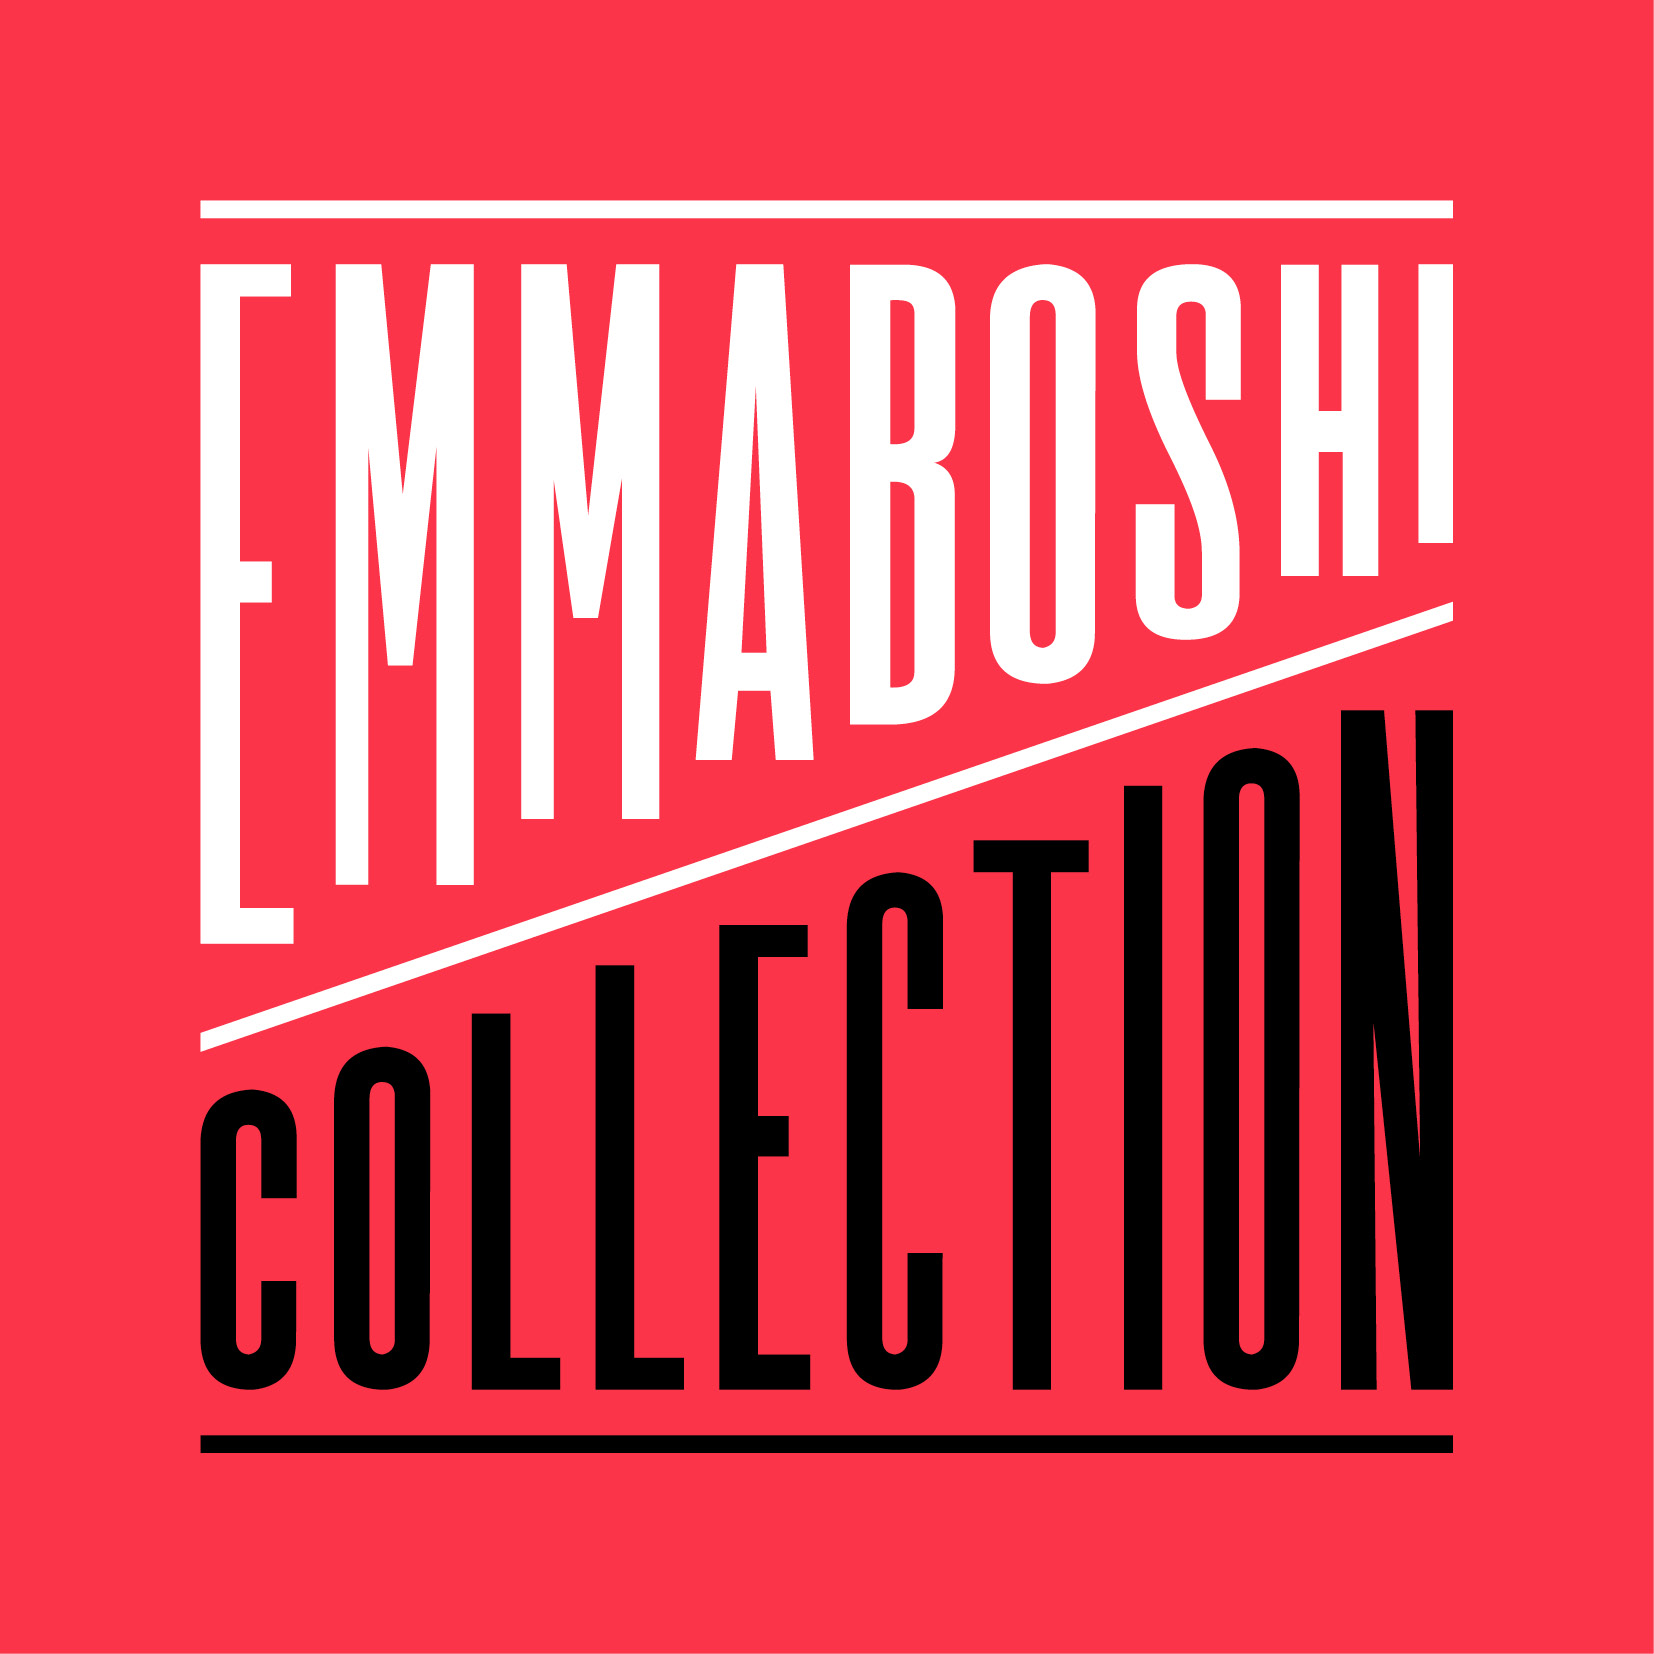 Logo Emmaboshi Collection3